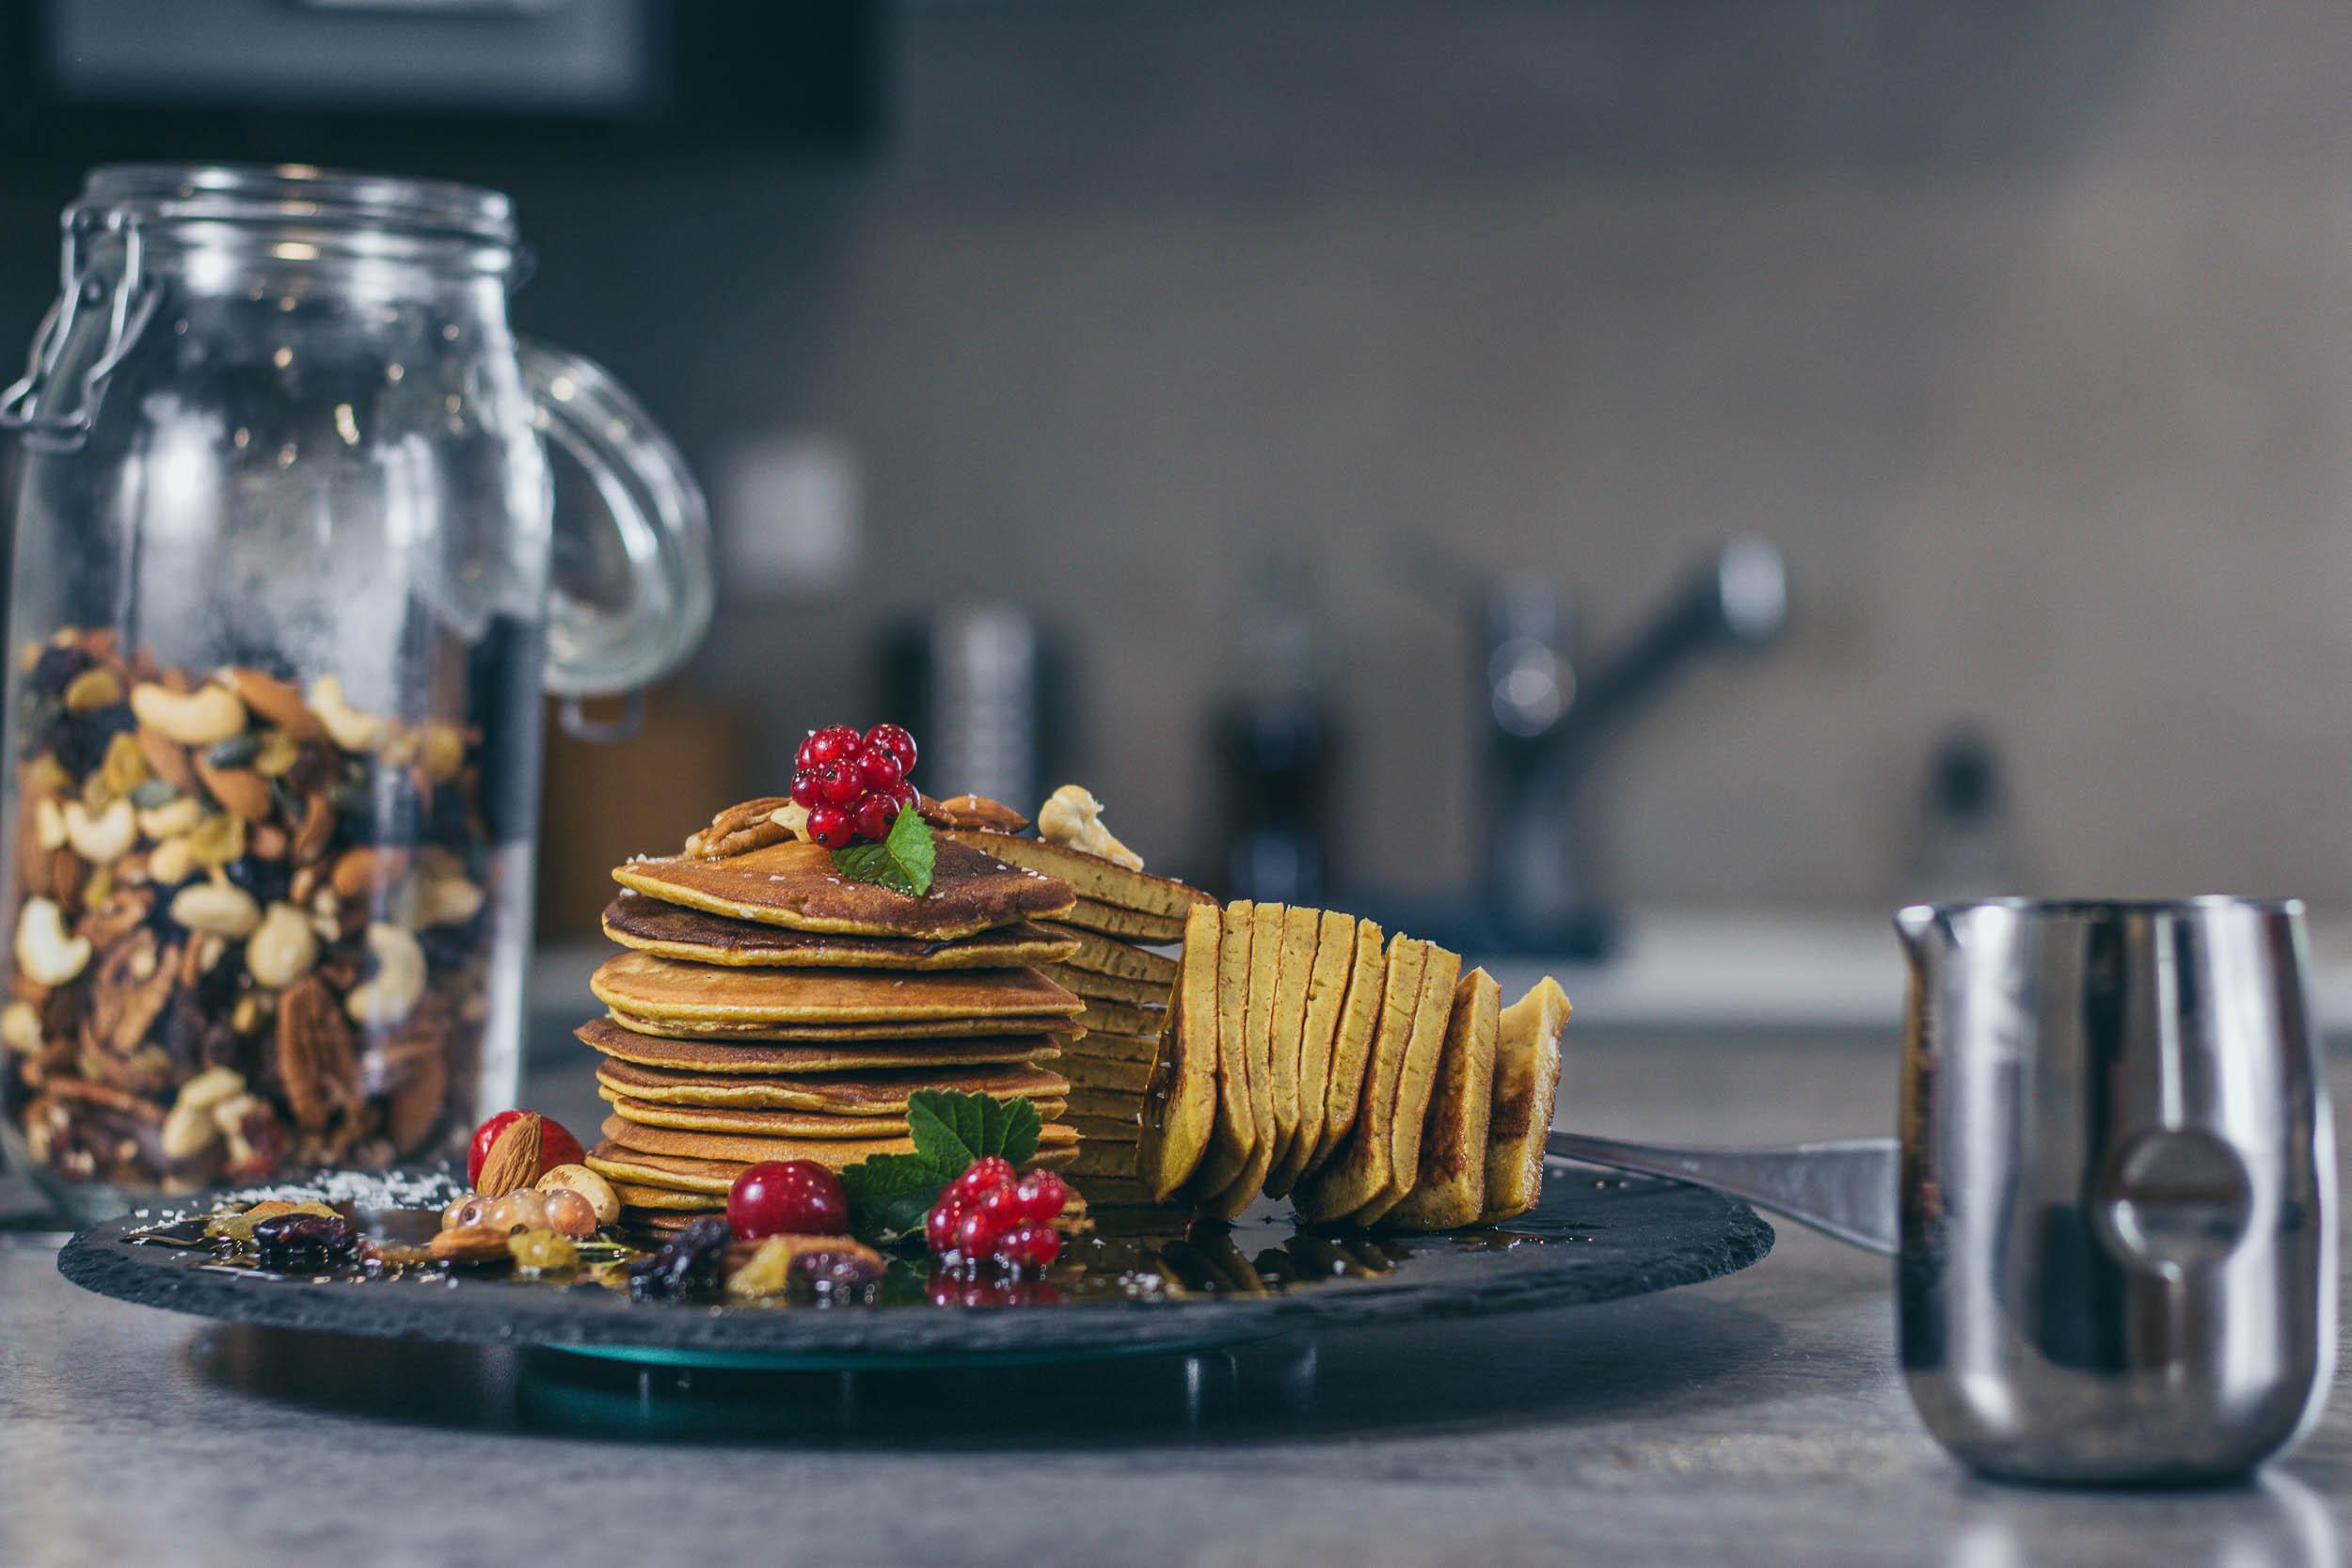 Culinaire-photographe-besançon-gui2raw